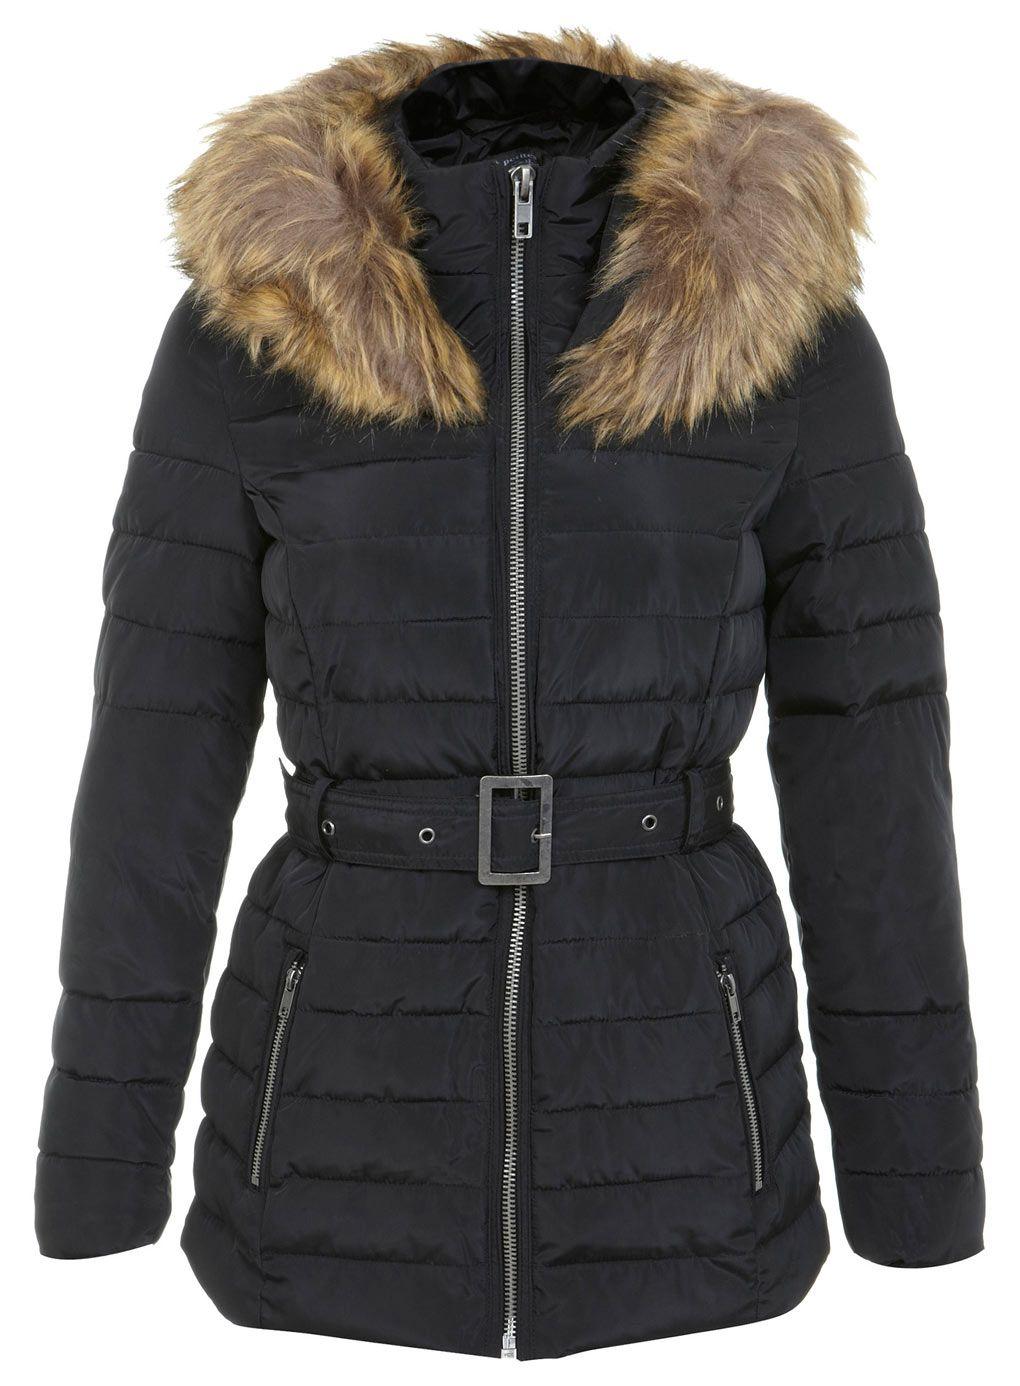 Petites Fur Hood Puffer Jacket Black puffa coat, Jackets